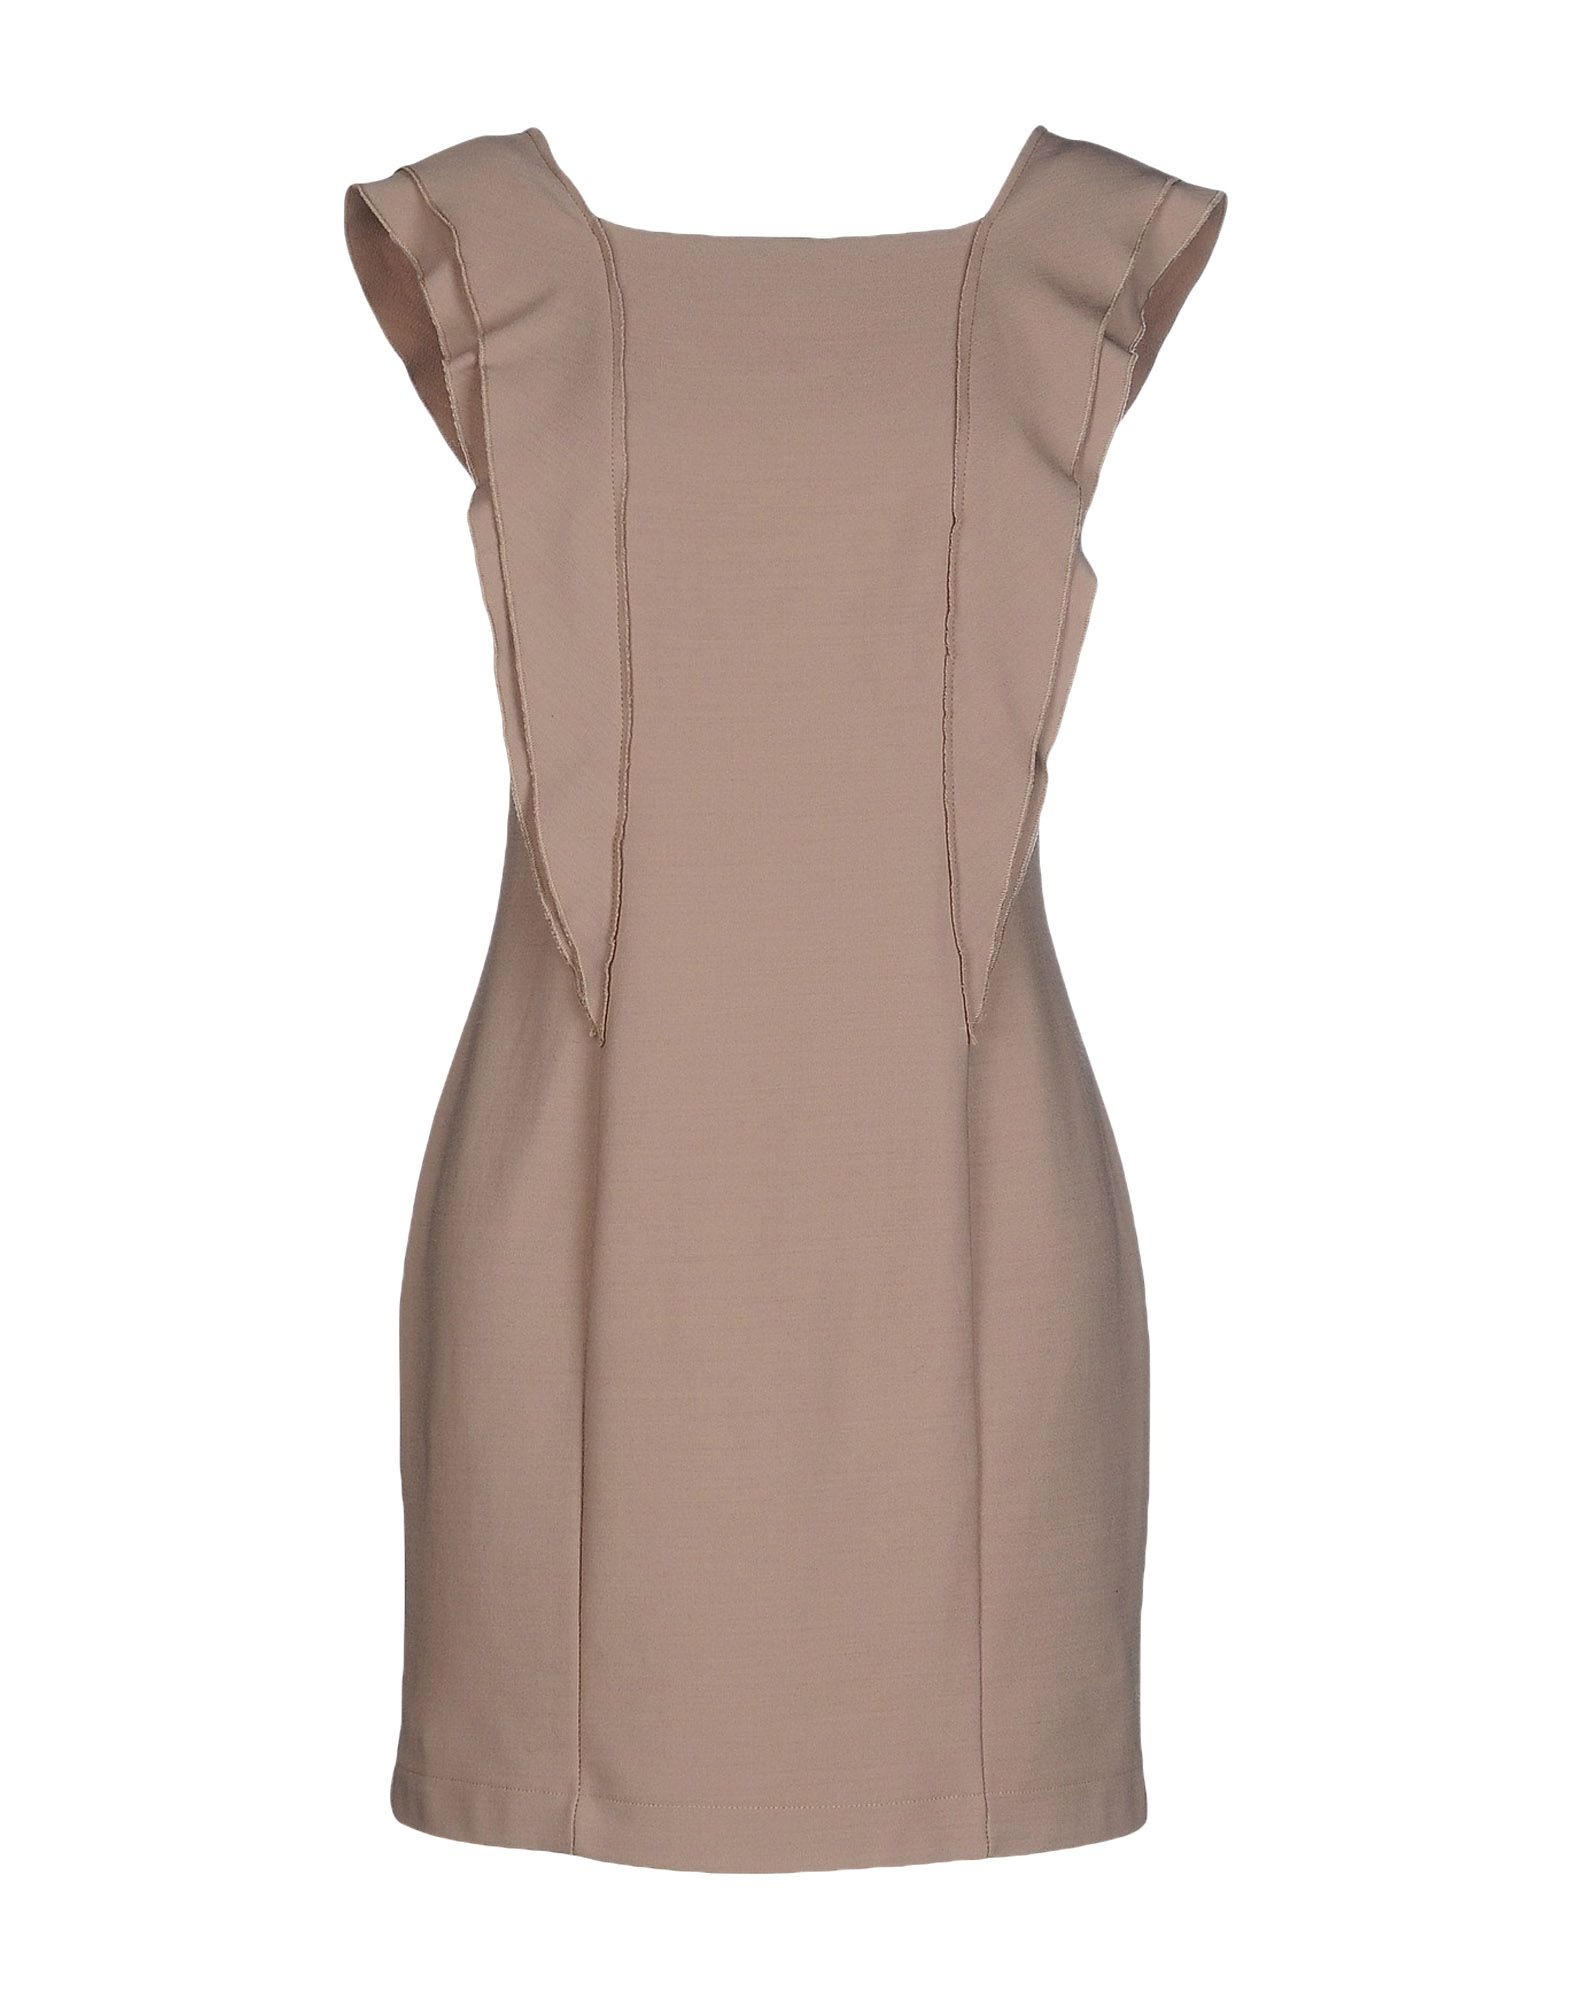 ANIYE BY Damen Kurzes Kleid Farbe Taubengrau Größe 6